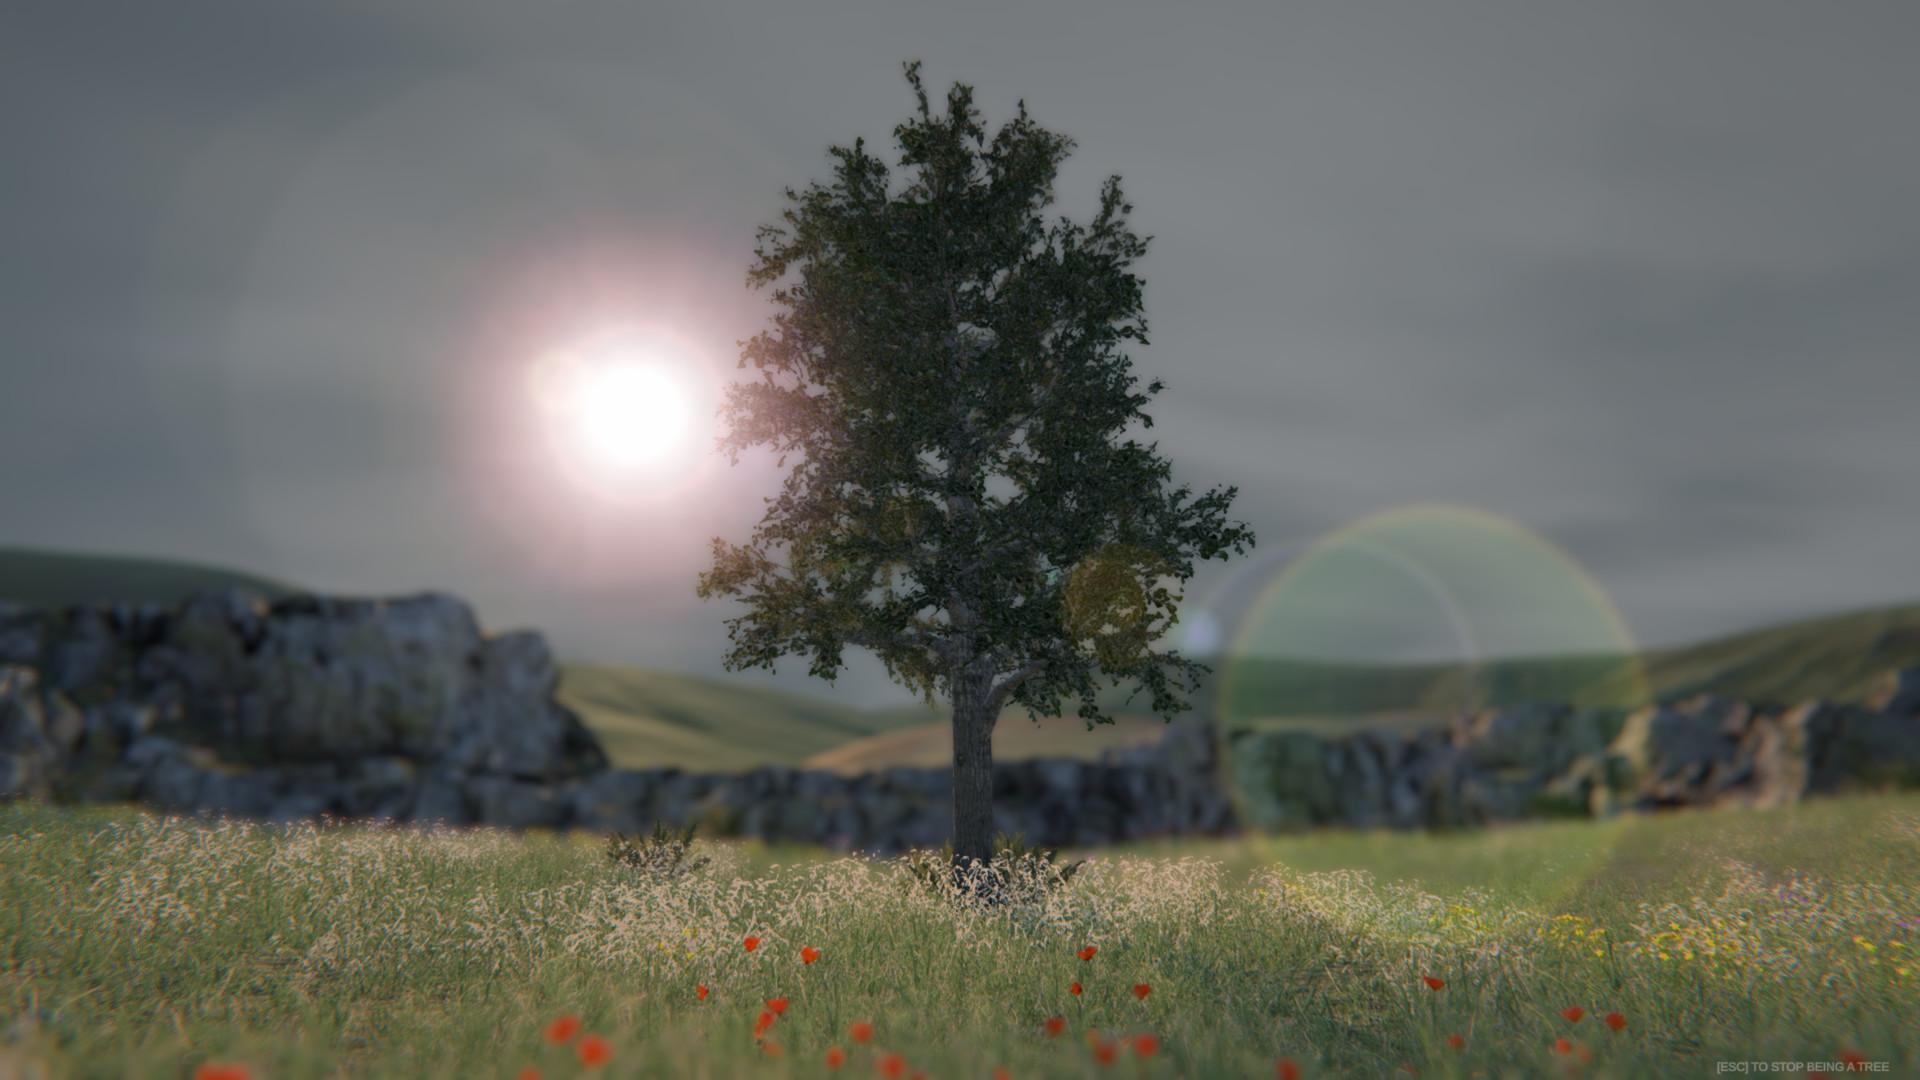 best steam bundles 2020 Save 40% on Tree Simulator 2020 on Steam